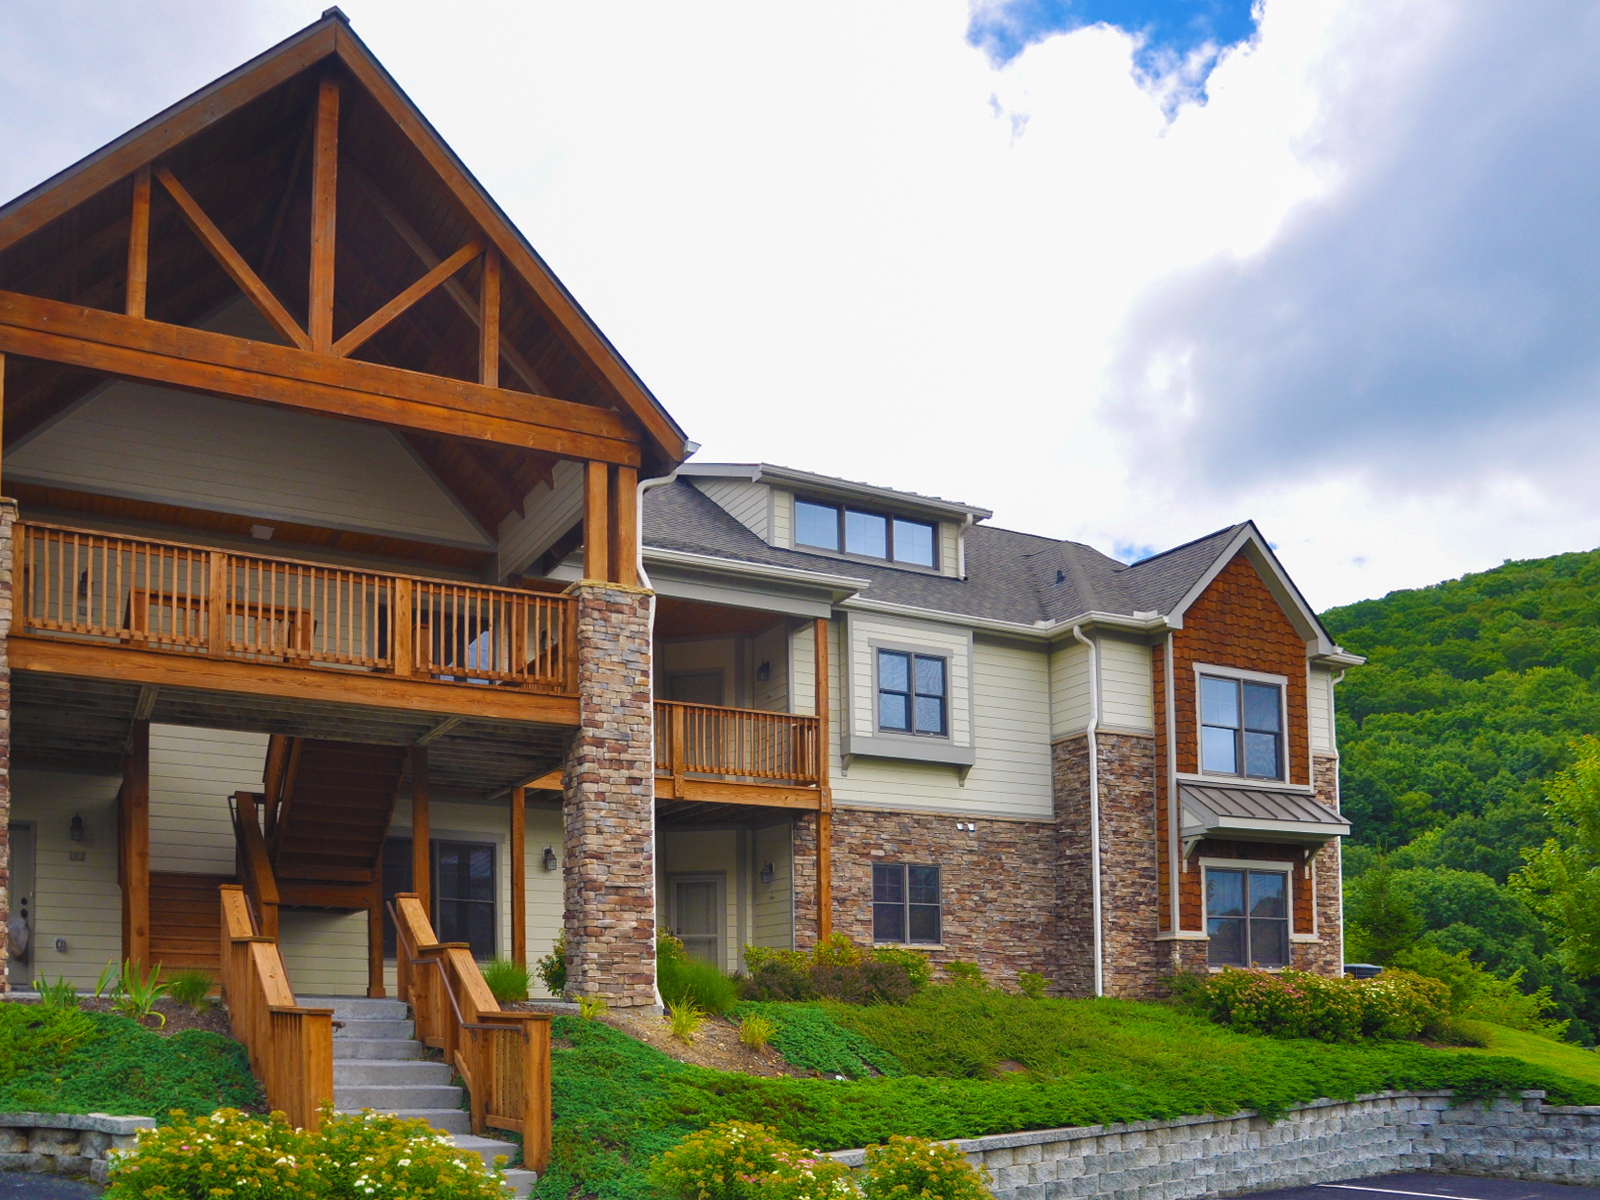 Condominium for Sale at The Lodges at Elkmont 135 F Wapiti Way Banner Elk, North Carolina 28604 United States